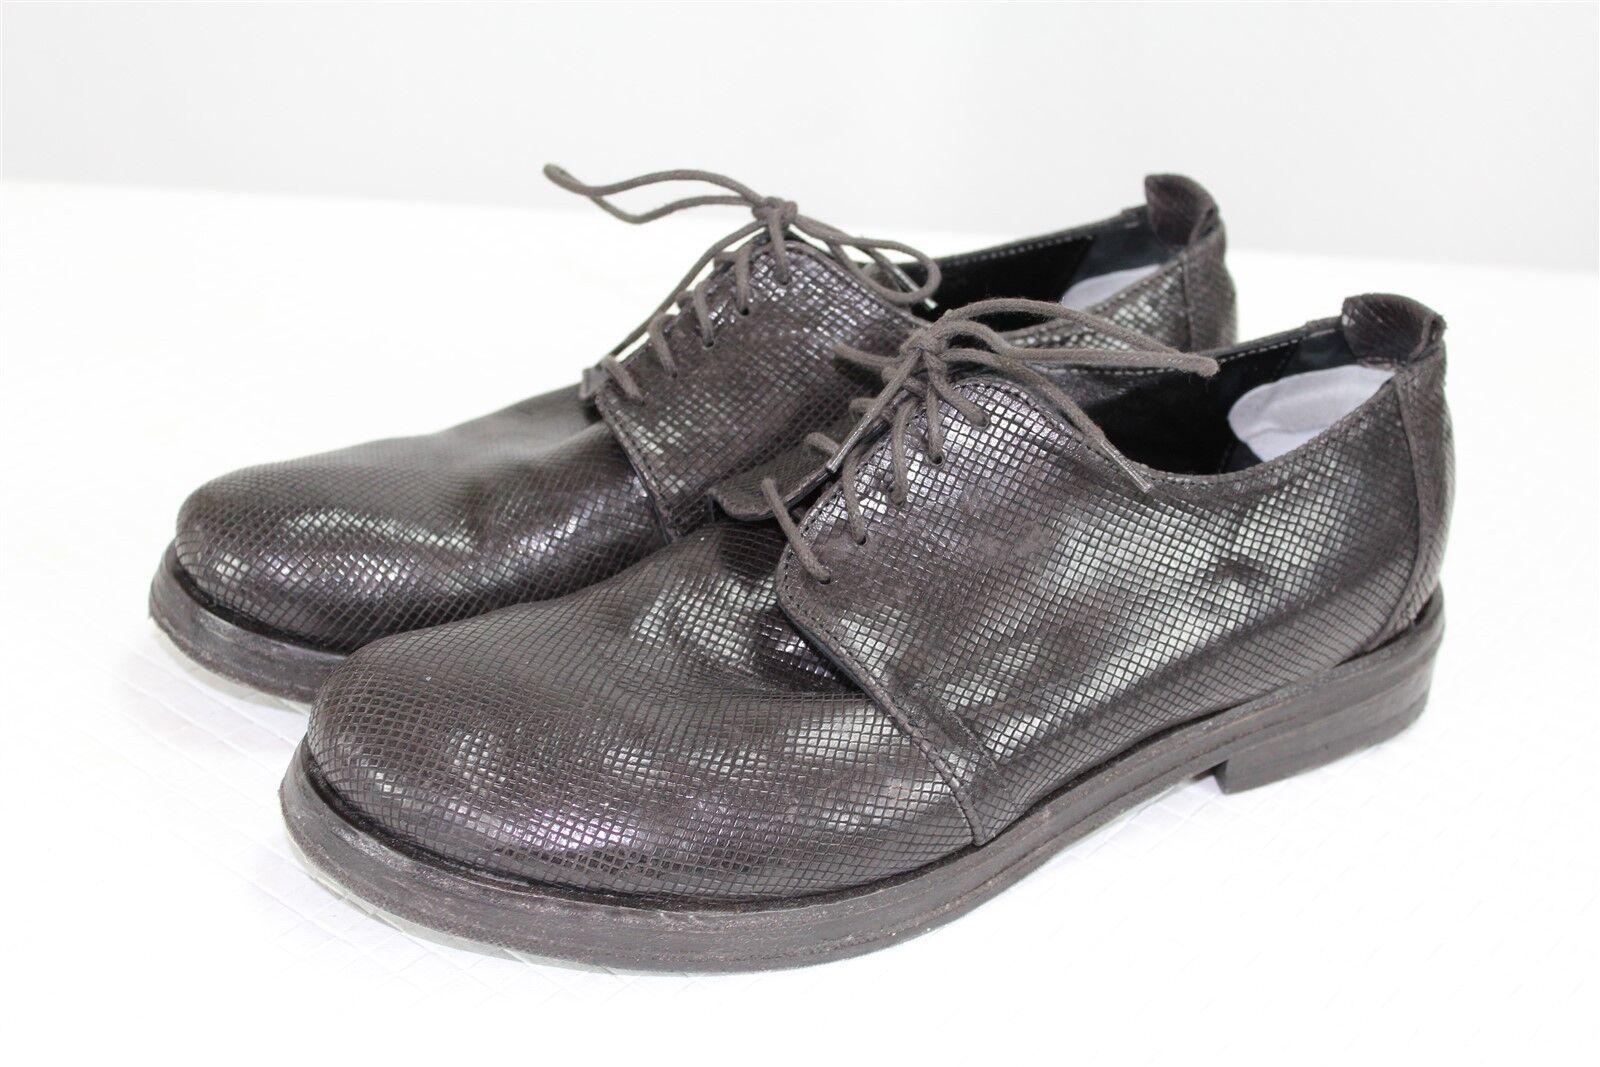 Saviobarbato Men's shoes 44 11-US Brown Square Grid Textured Leather